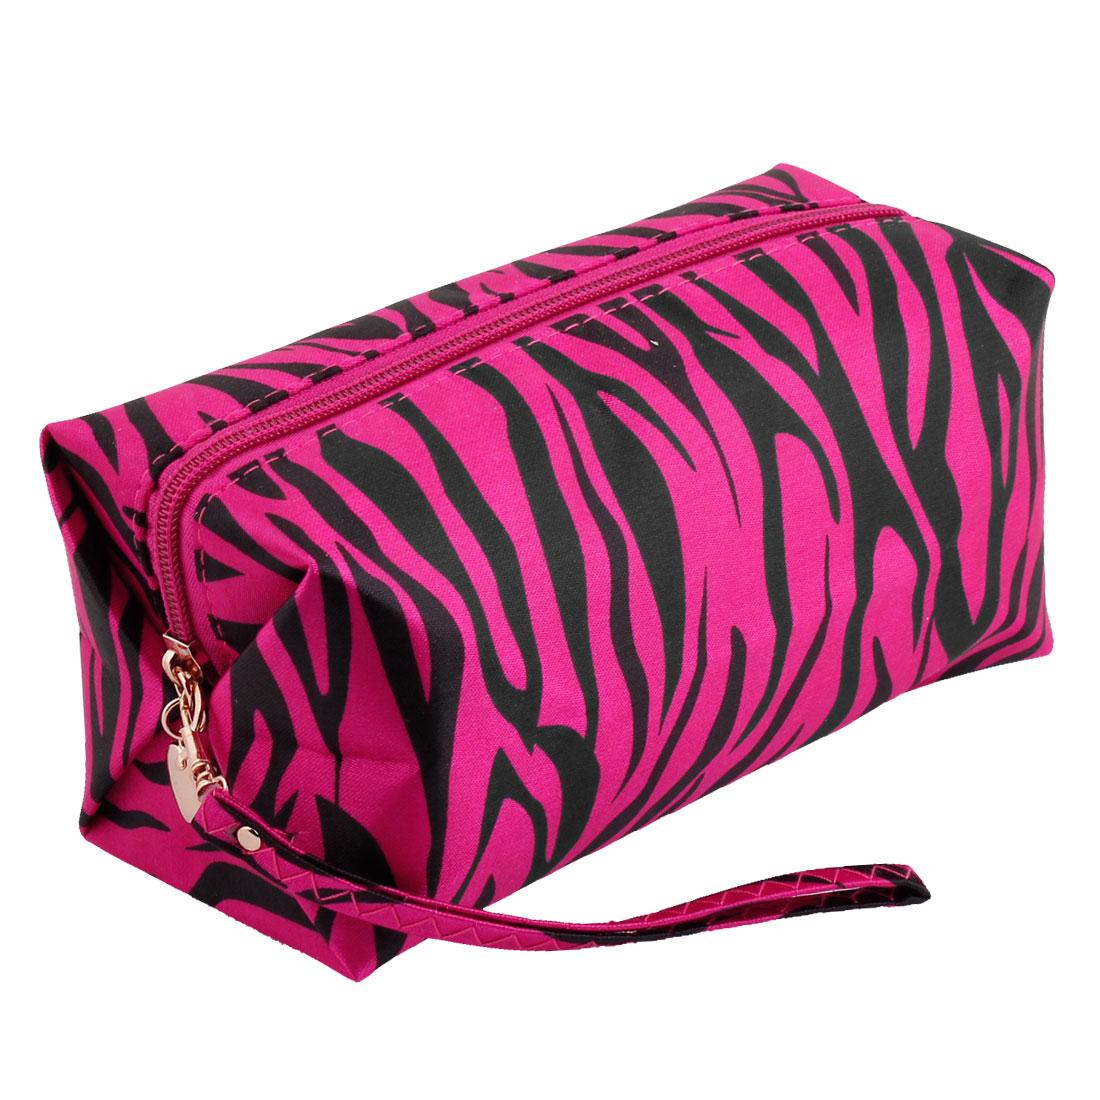 Lady Zipper Closure Black Zebra Pattern Toiletries Cosmetic Pouch Bag Fuchsia